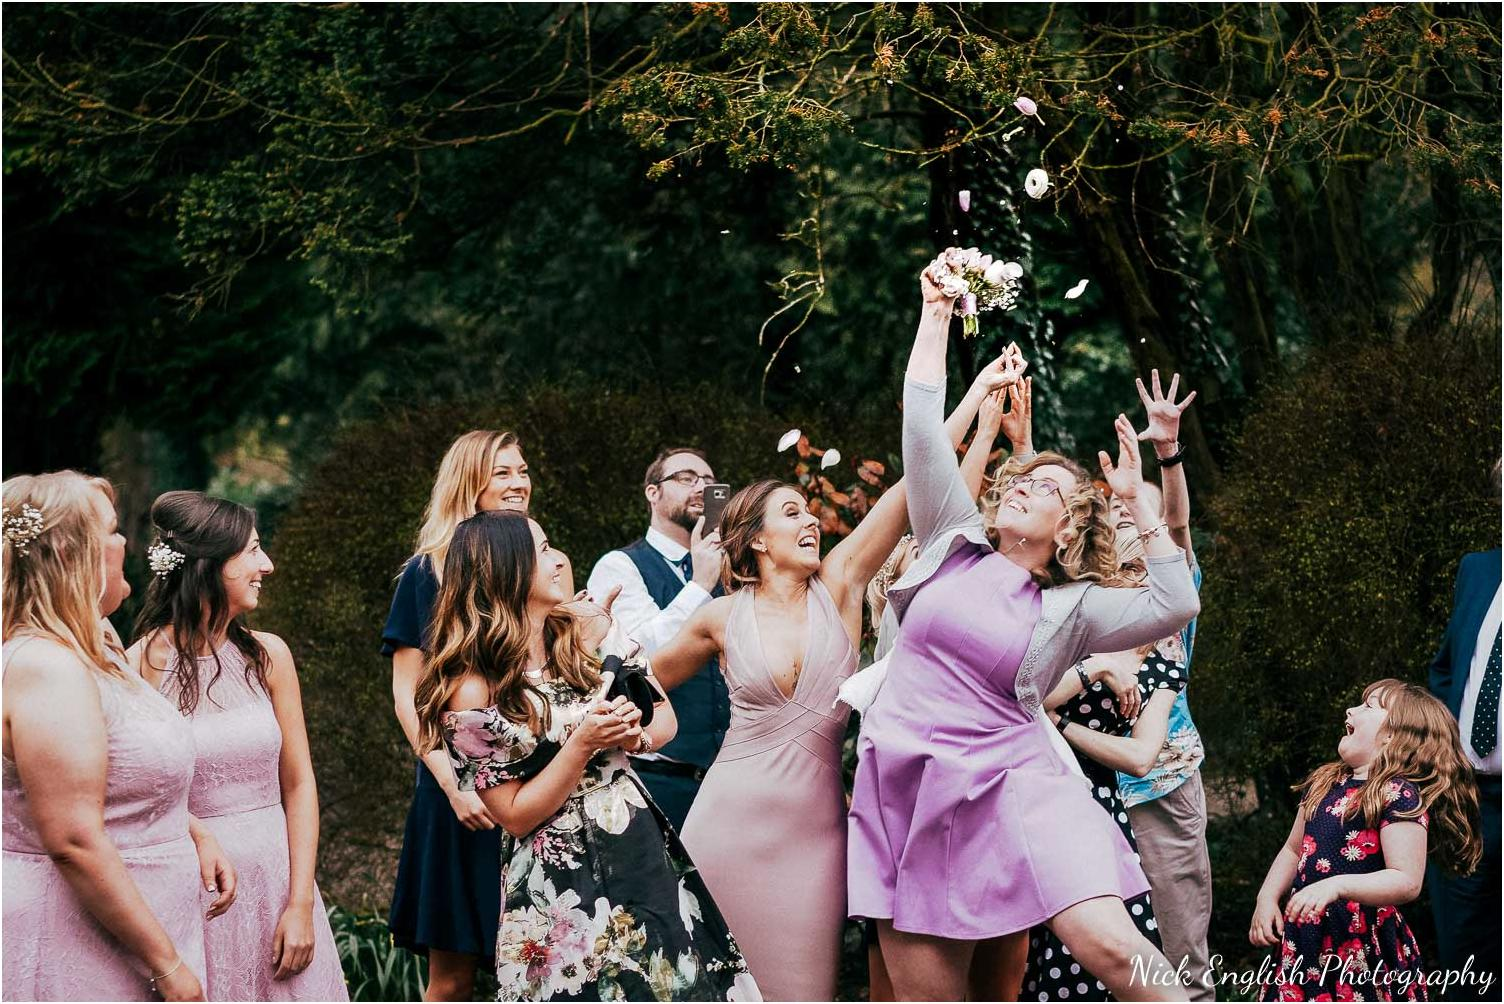 Mitton_Hall_Wedding_Photographer_2018-148.jpg